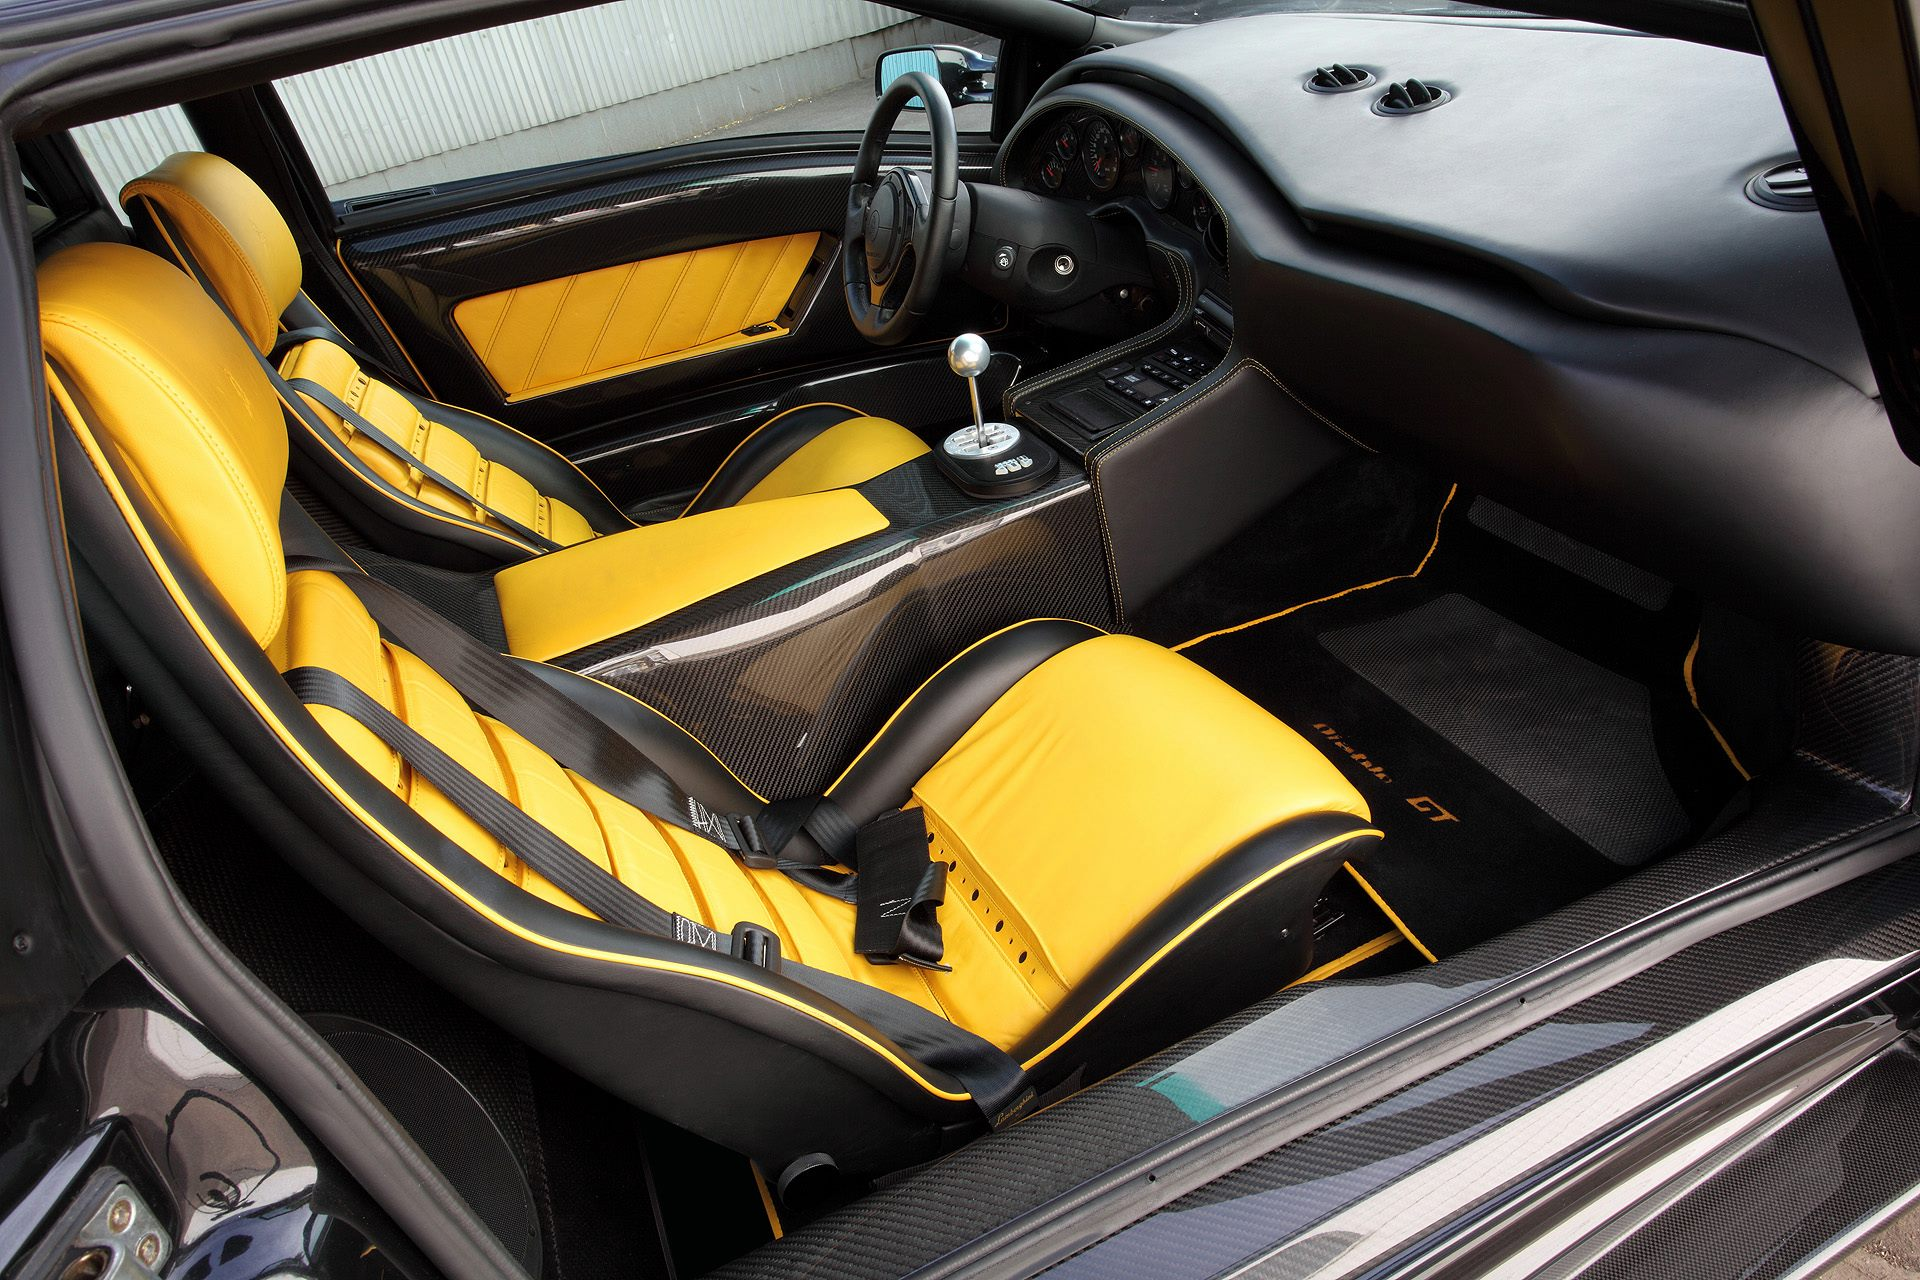 Rare Lamborghini Diablo Gt Gets Carbon Fiber Accents From Topcar